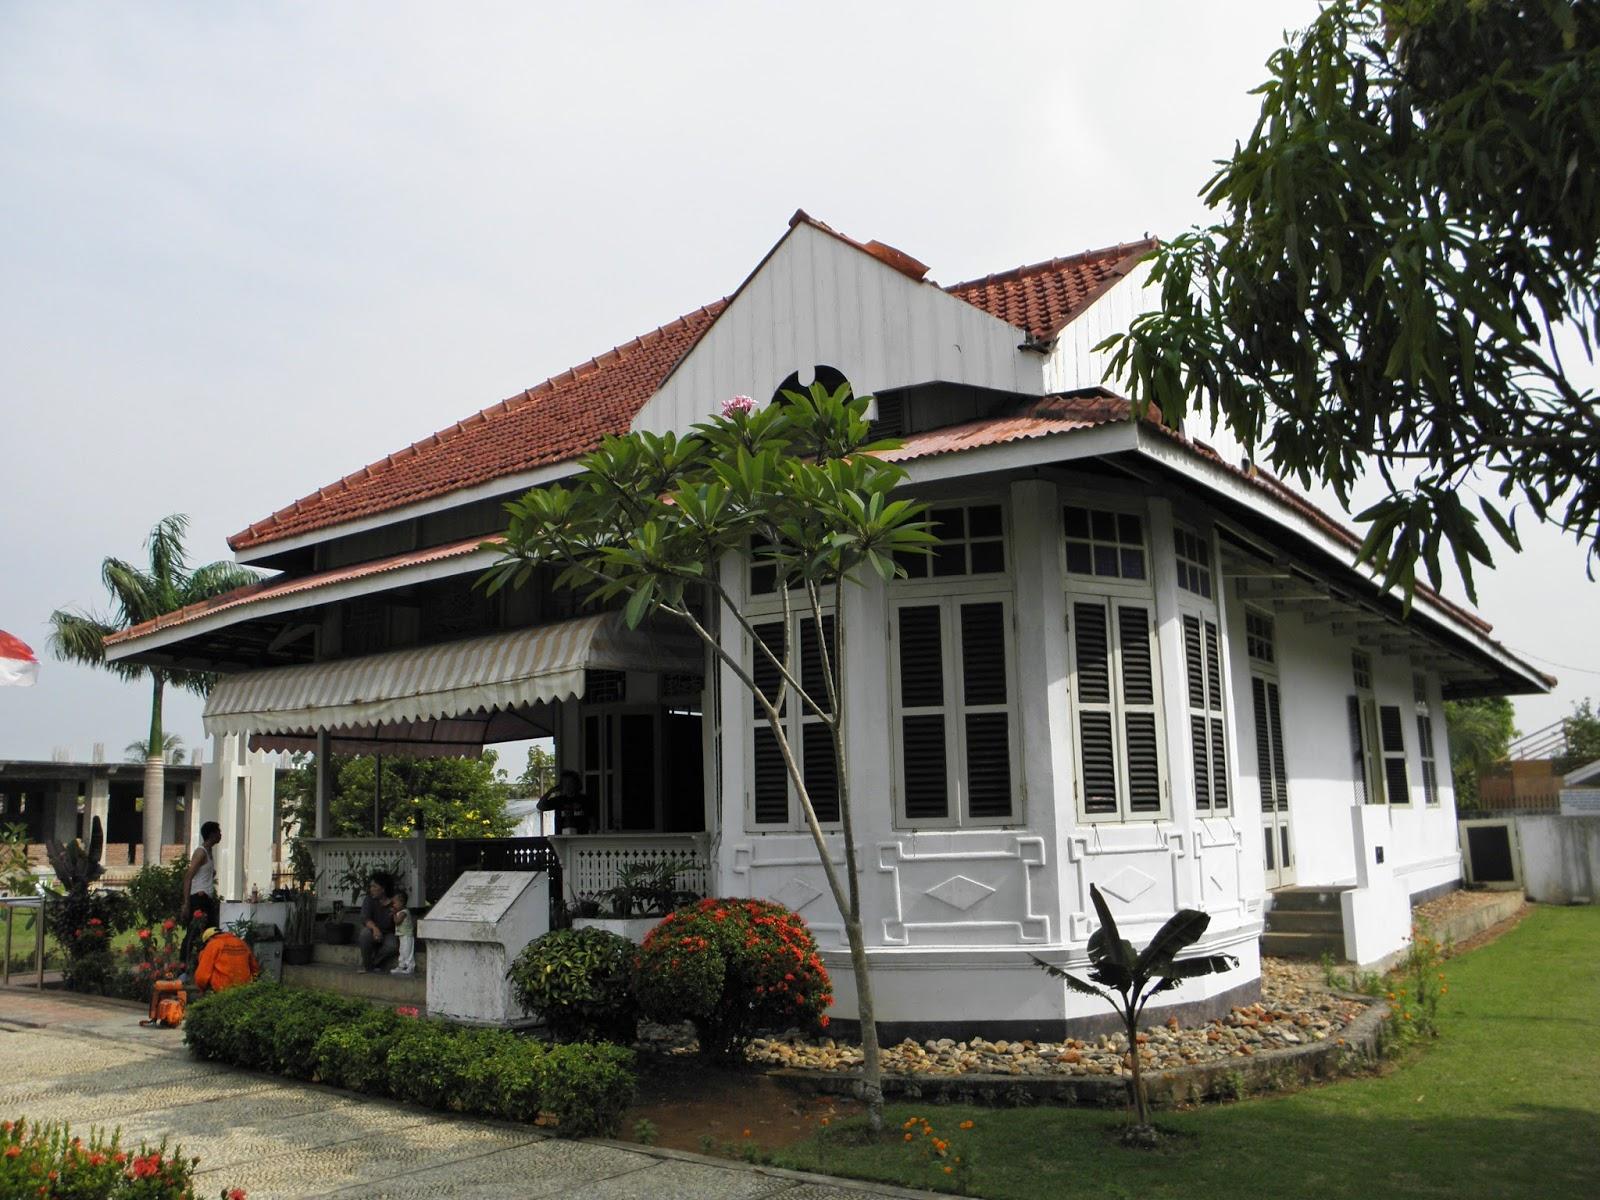 7 Tempat Wisata Kota Bengkulu Jalan Indonesia Rumah Pengasingan Bung